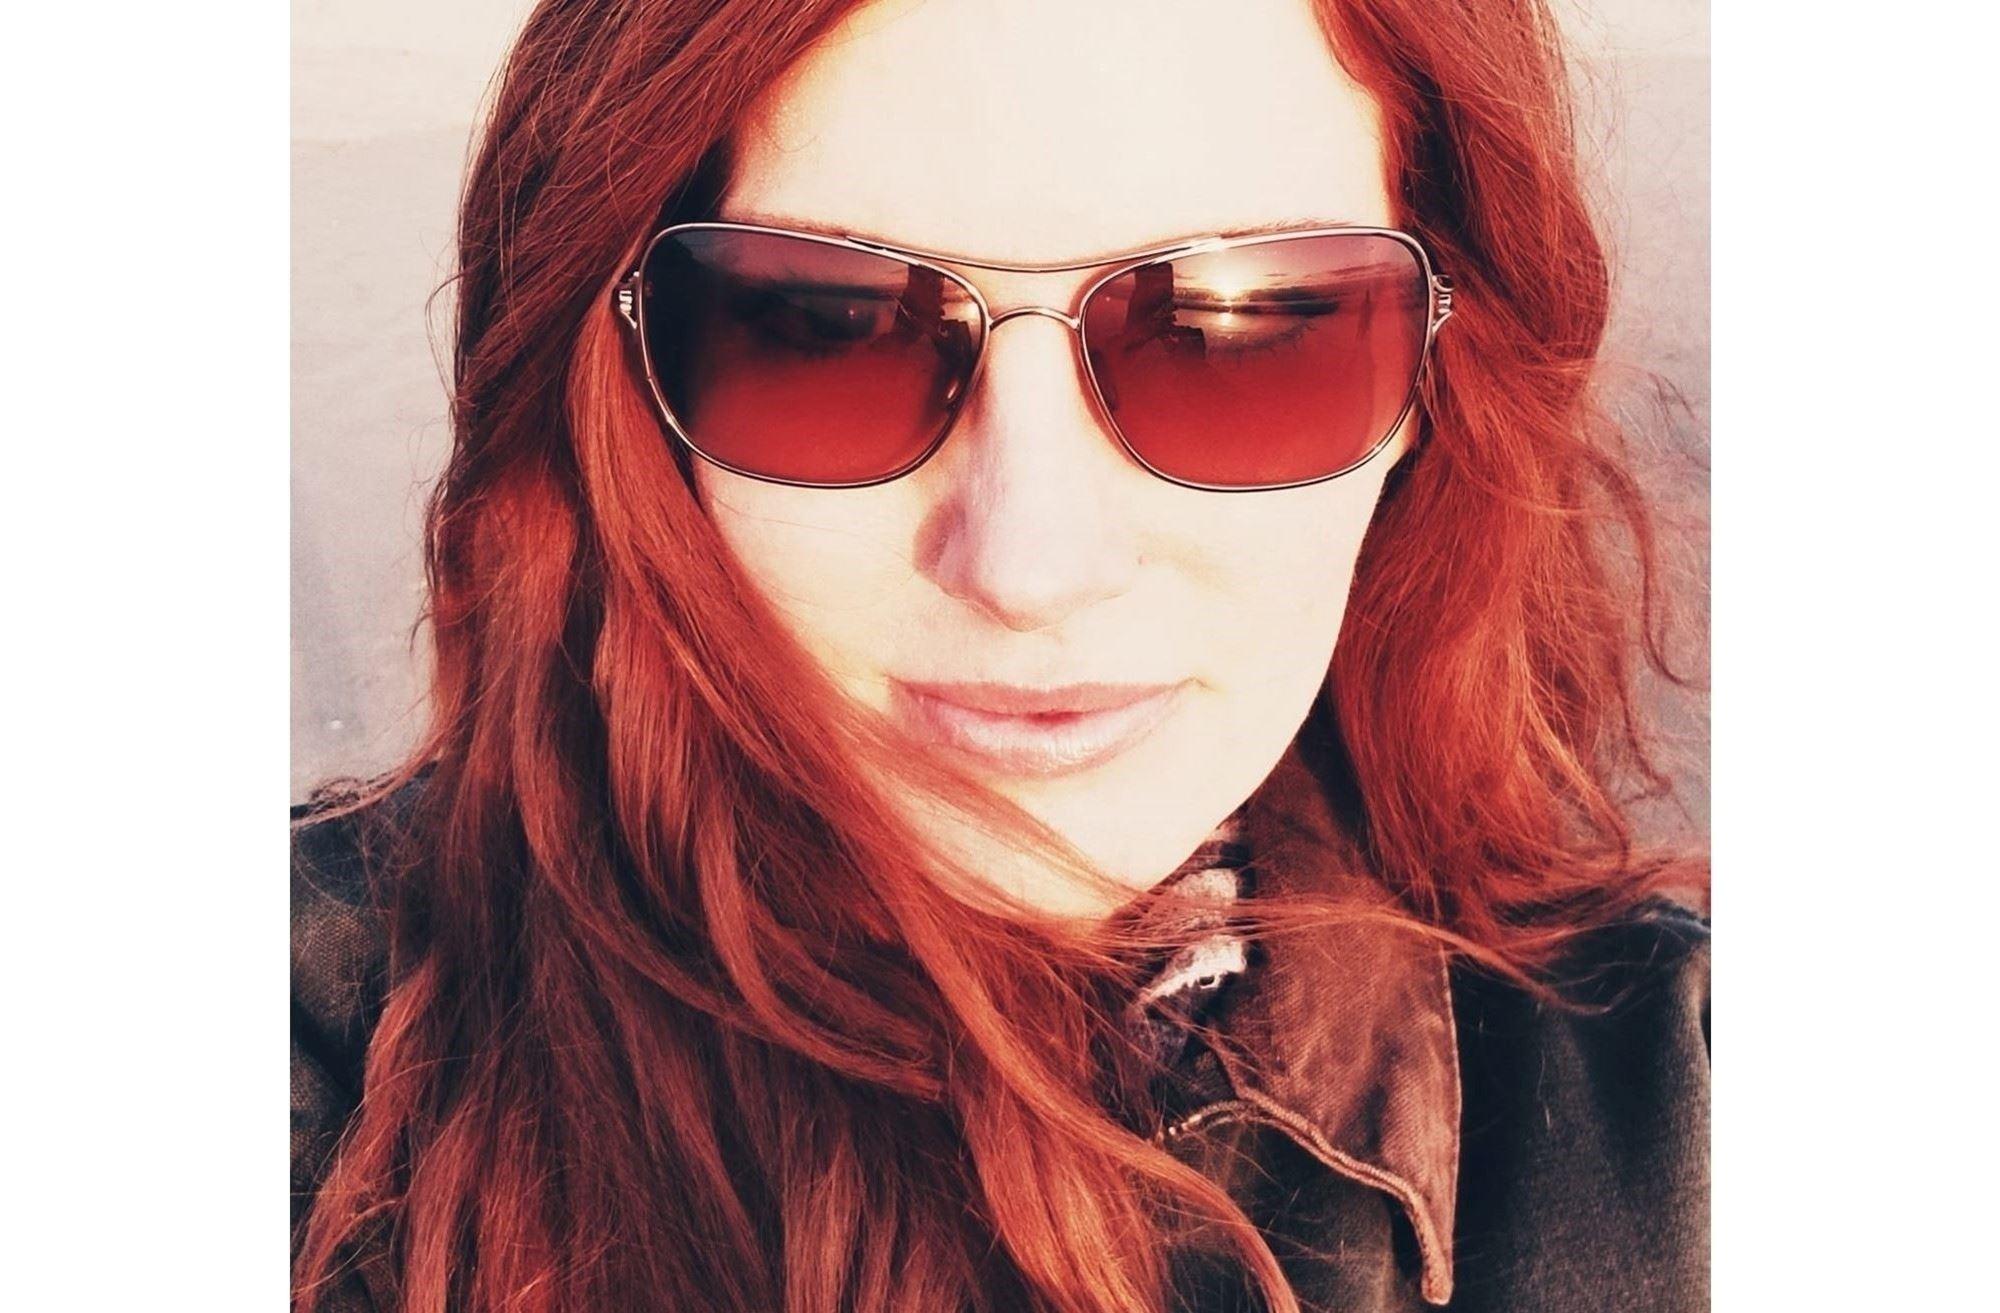 Photo: Catherine Loyer headshot wearing sunglasses